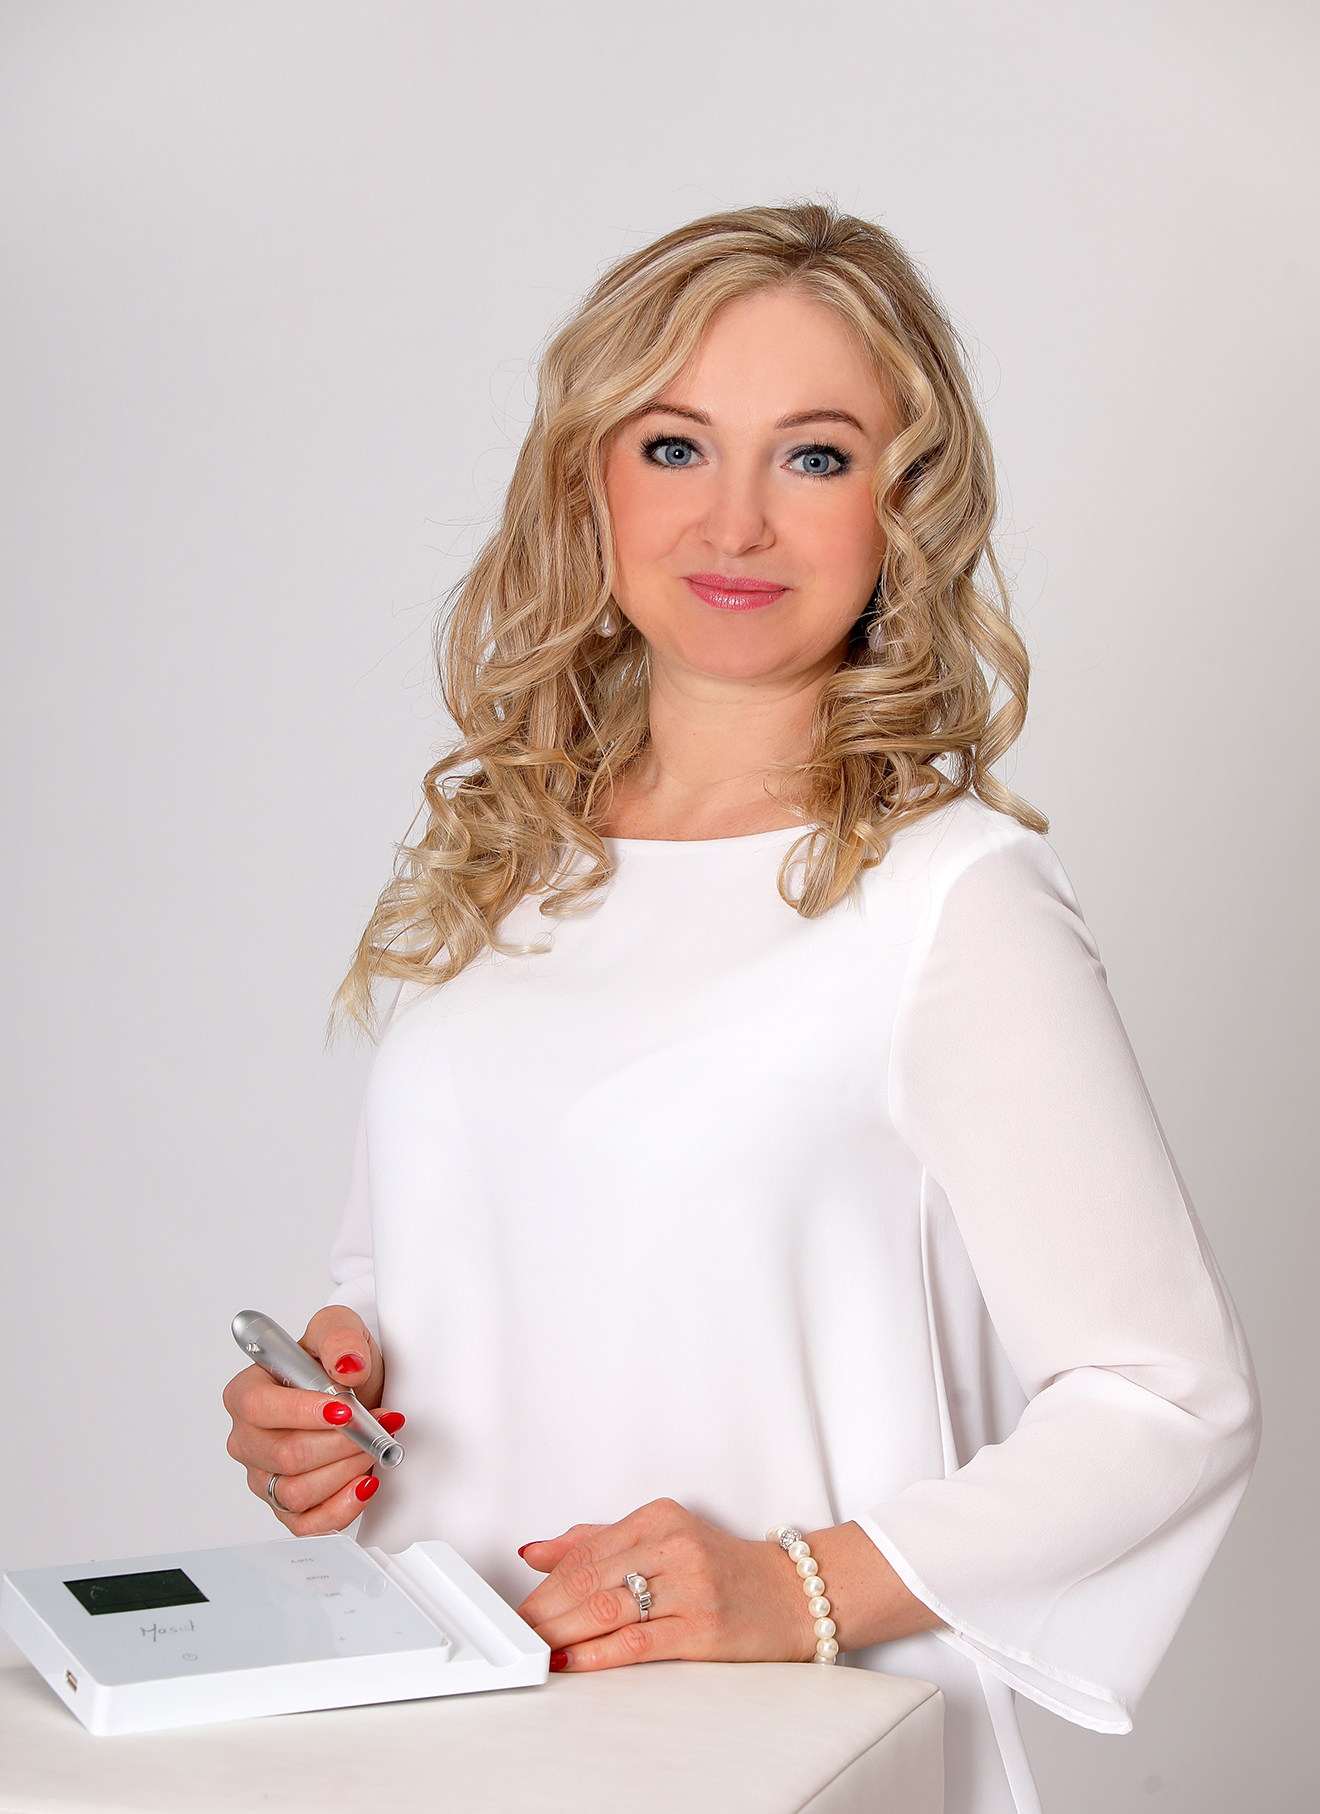 Karina Steimecke